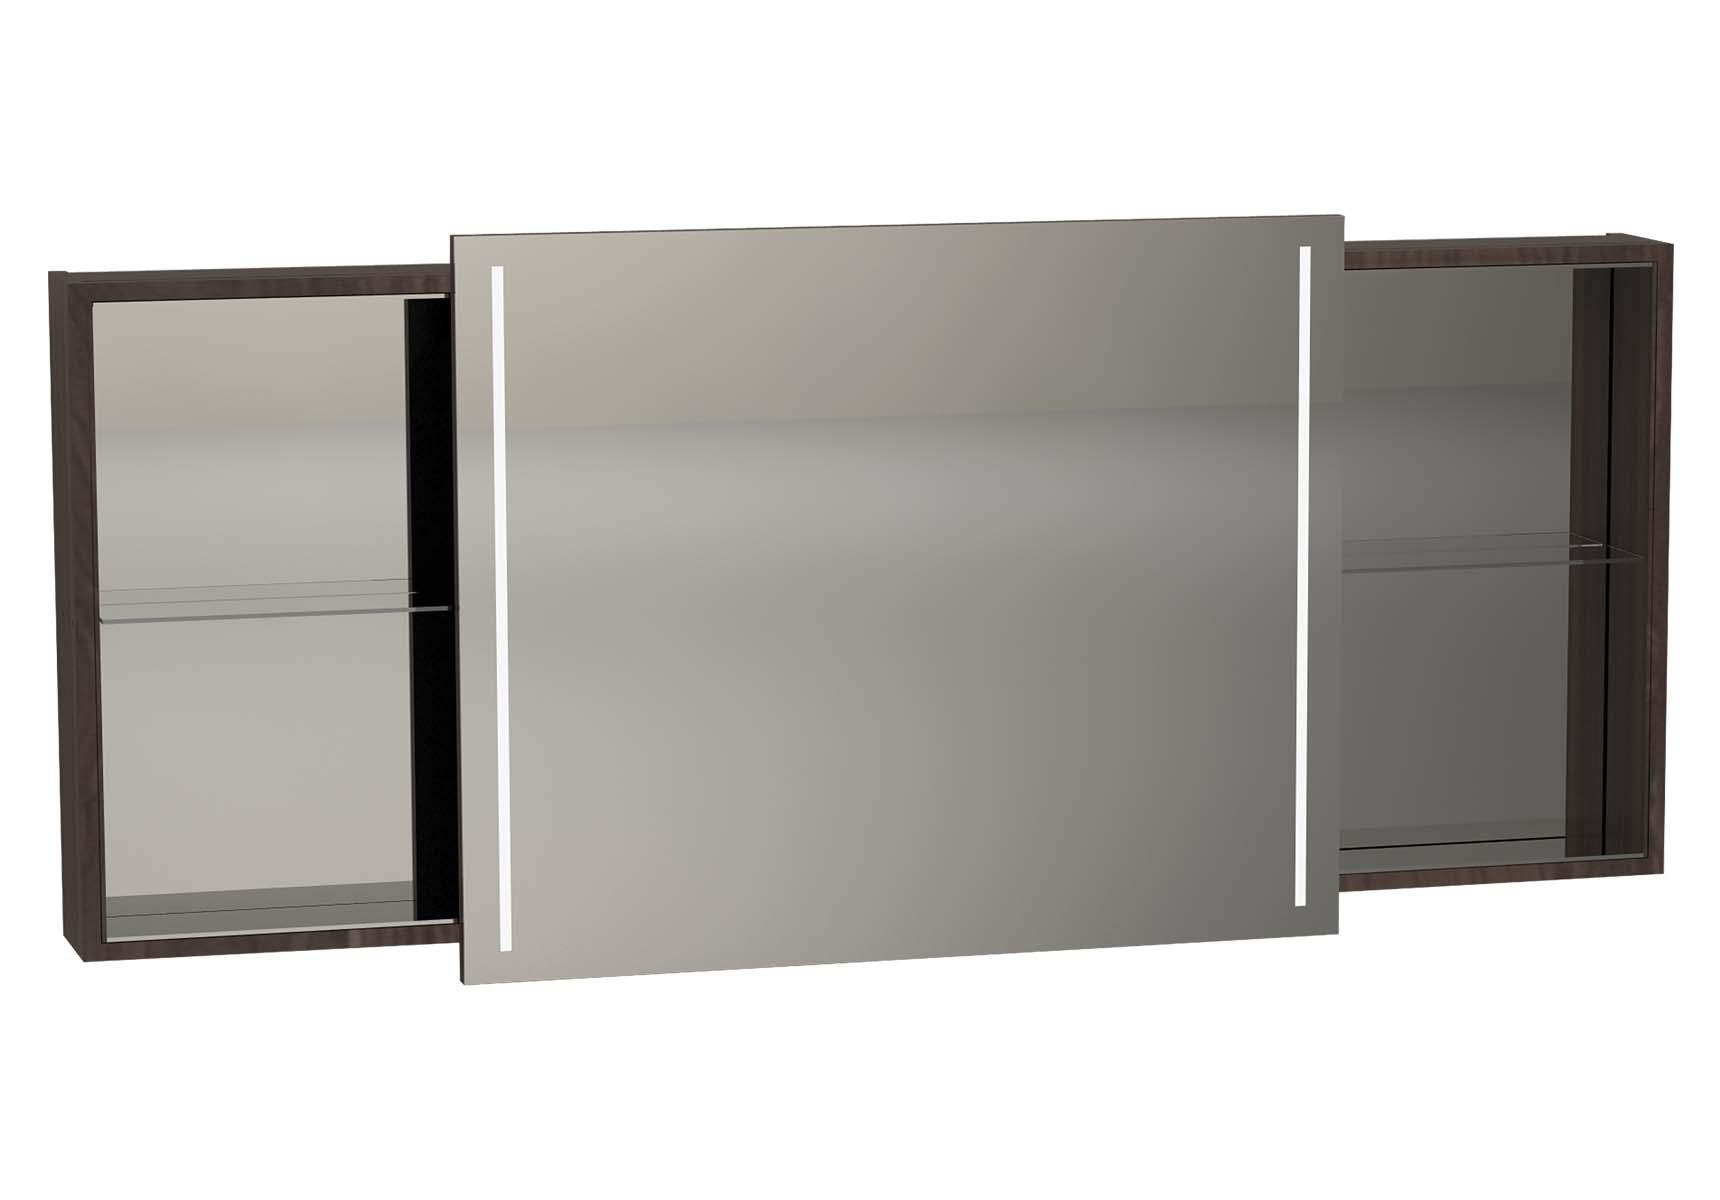 Memoria Illuminated Mirror Cabinet, 150 cm, Matte Walnut